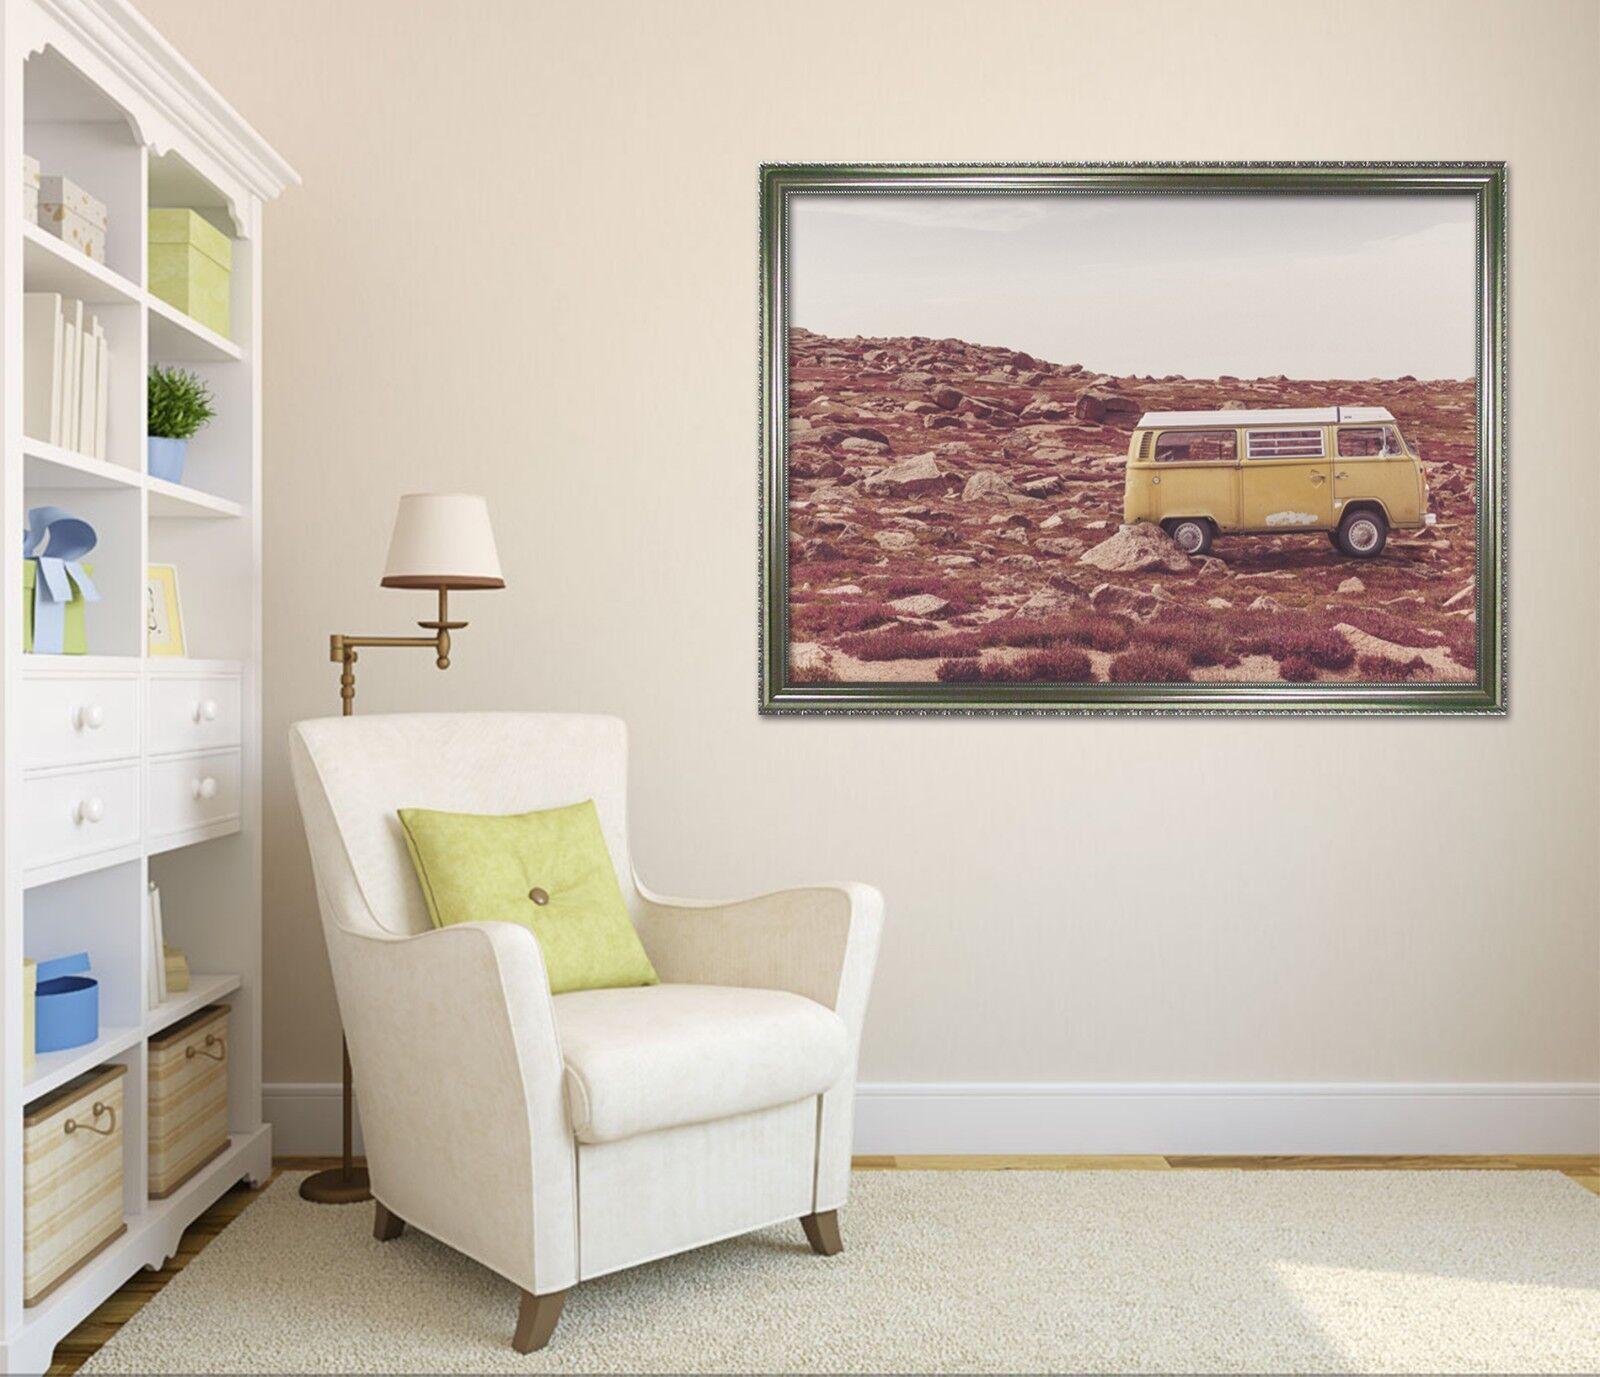 3D Land coche 5 Póster Enmarcado Decoración del Hogar Pintura de Impresión Arte AJ Wallpaper